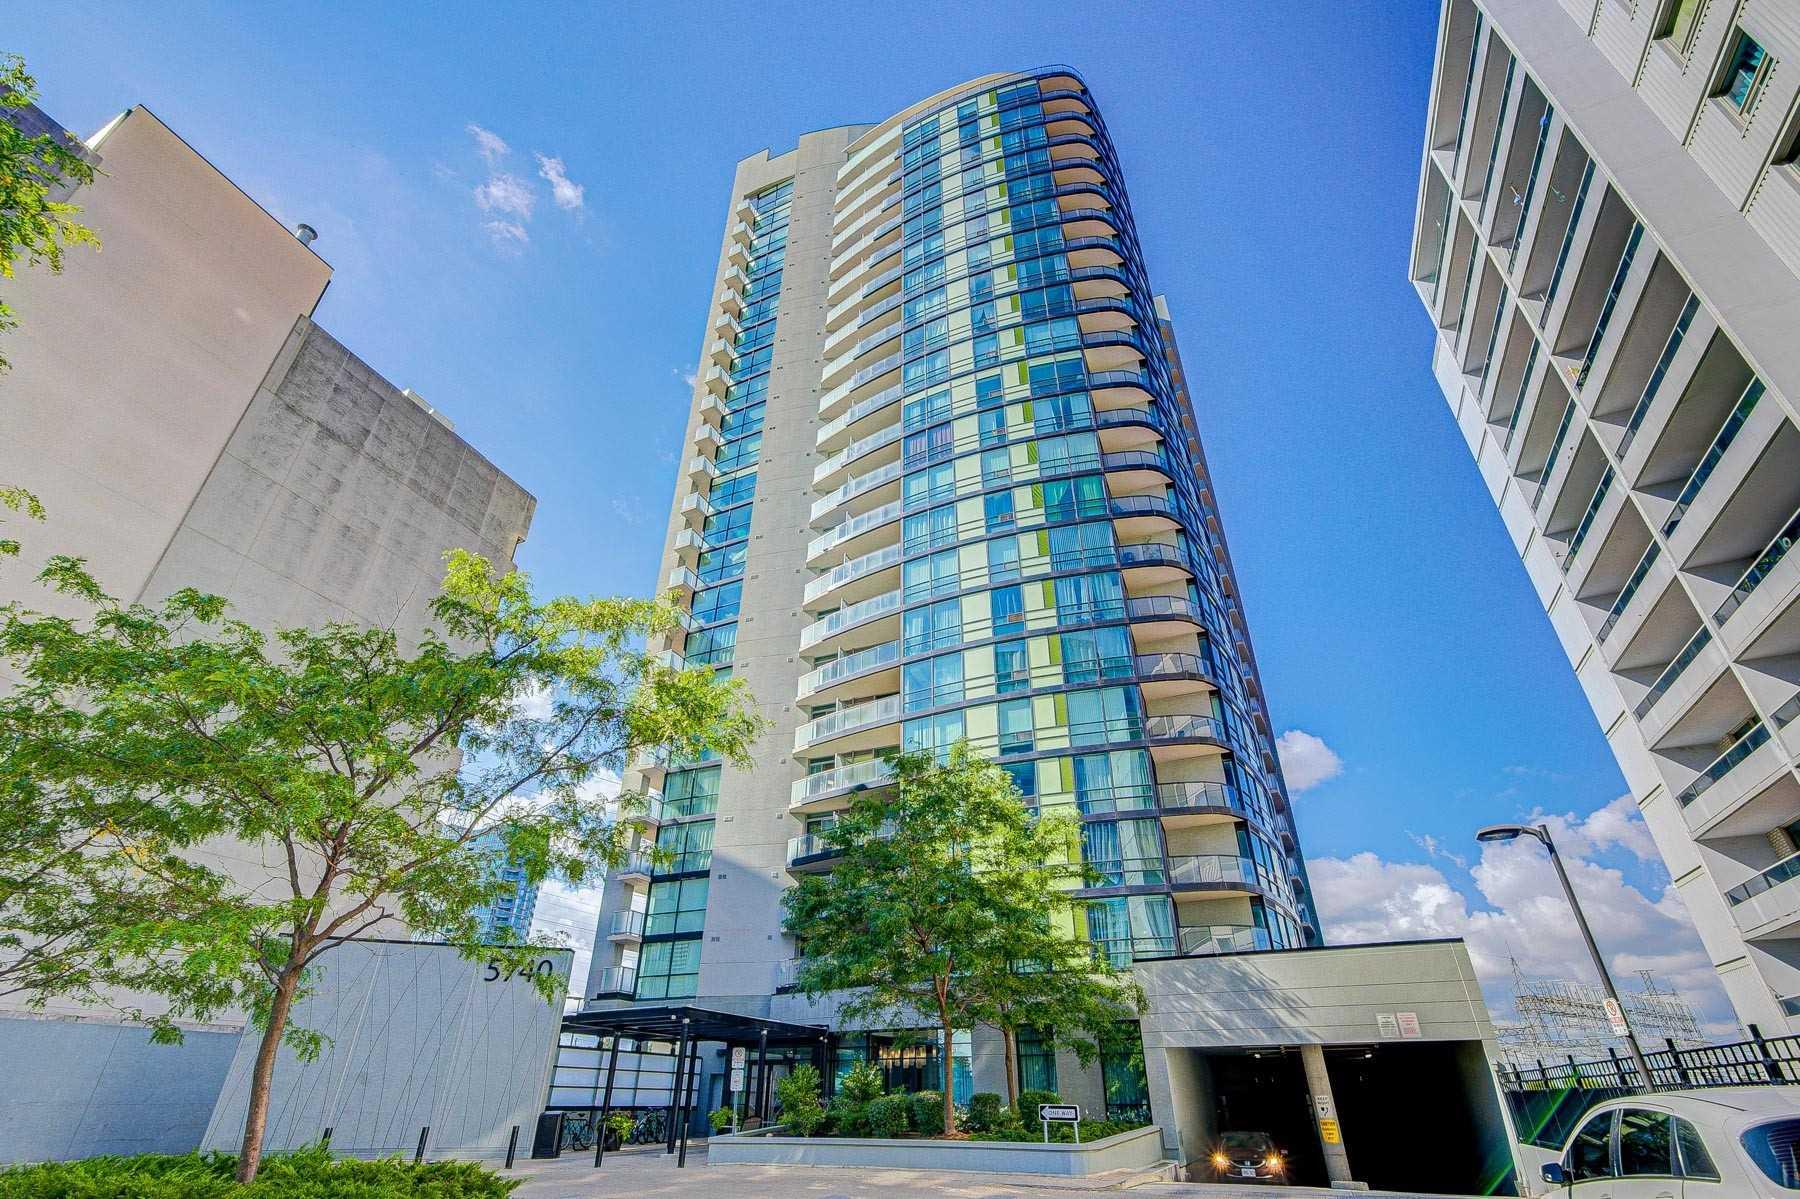 Condo Apt For Sale In Toronto , 2 Bedrooms Bedrooms, ,2 BathroomsBathrooms,Condo Apt,For Sale,1207,Yonge